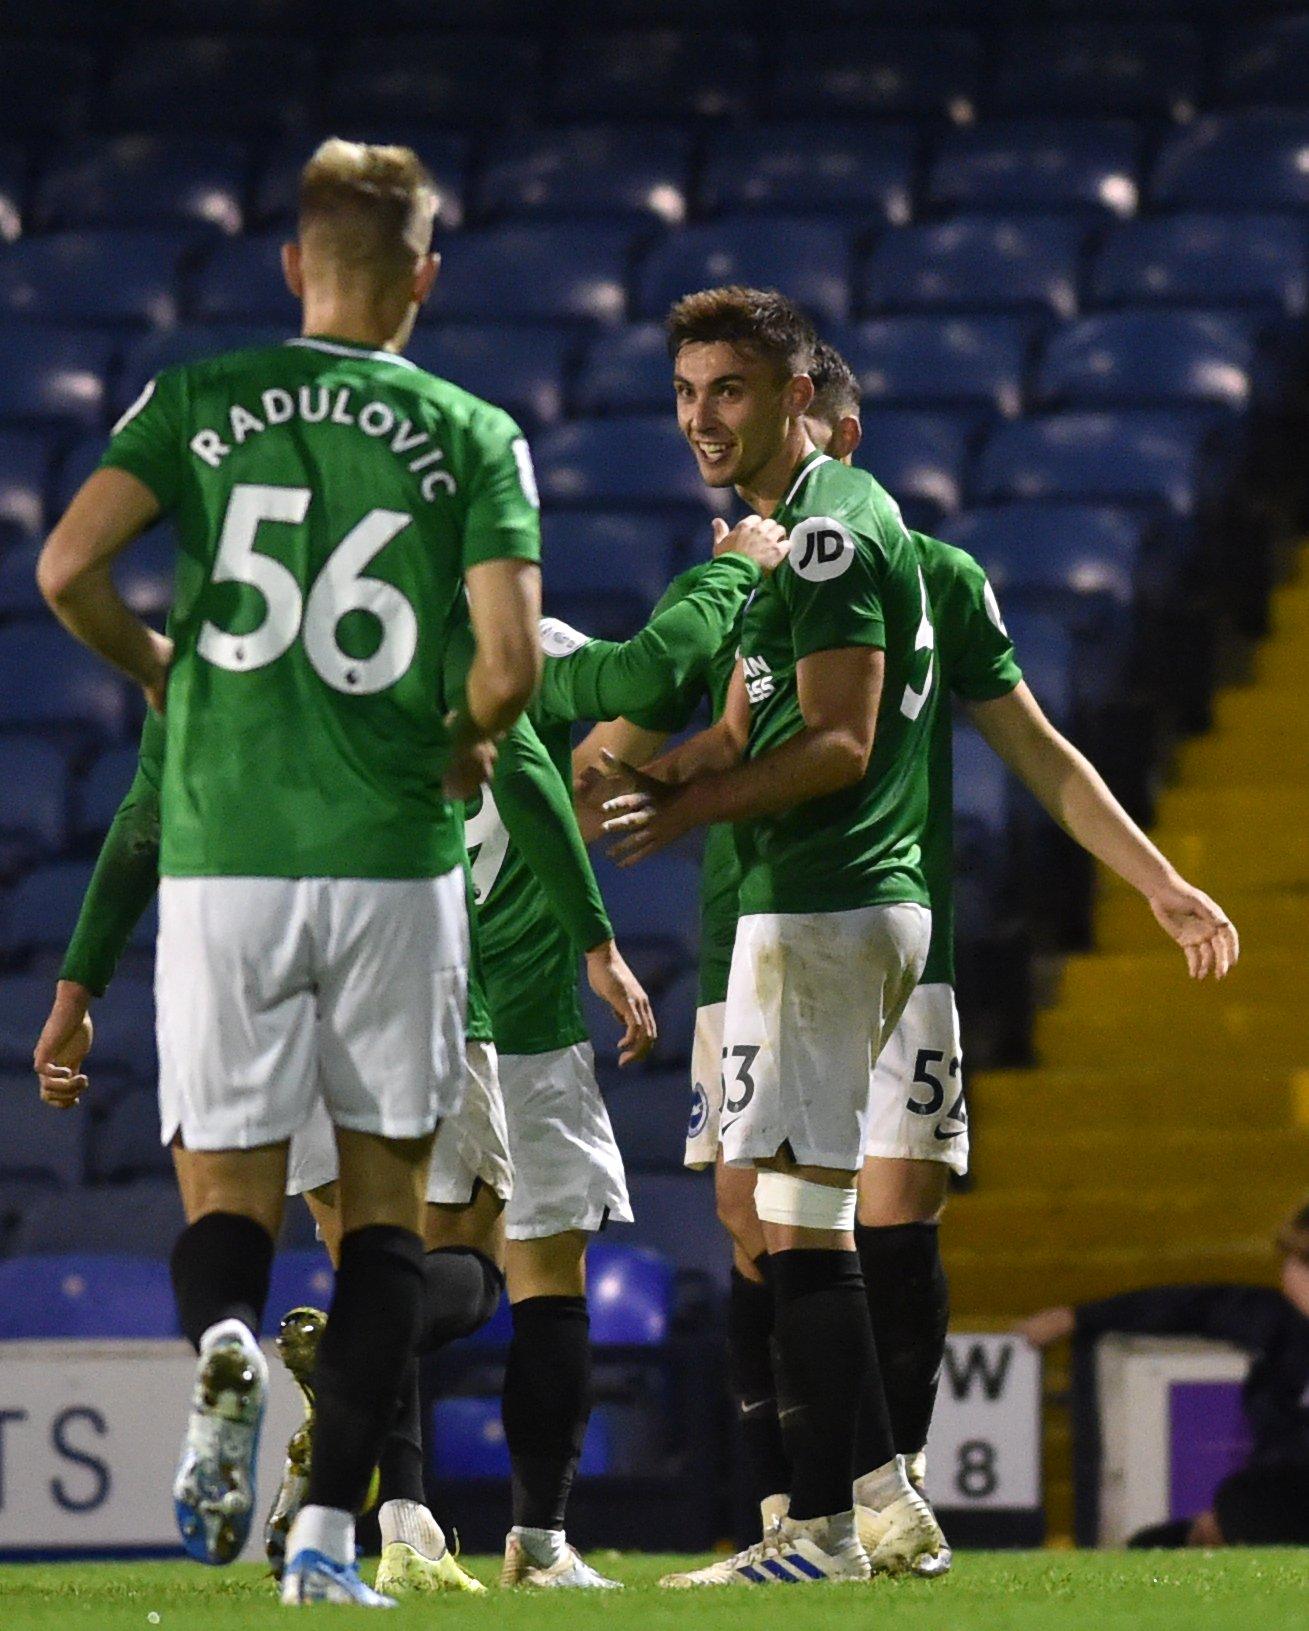 Warren O'Hora aims to be Albion's next Irish success